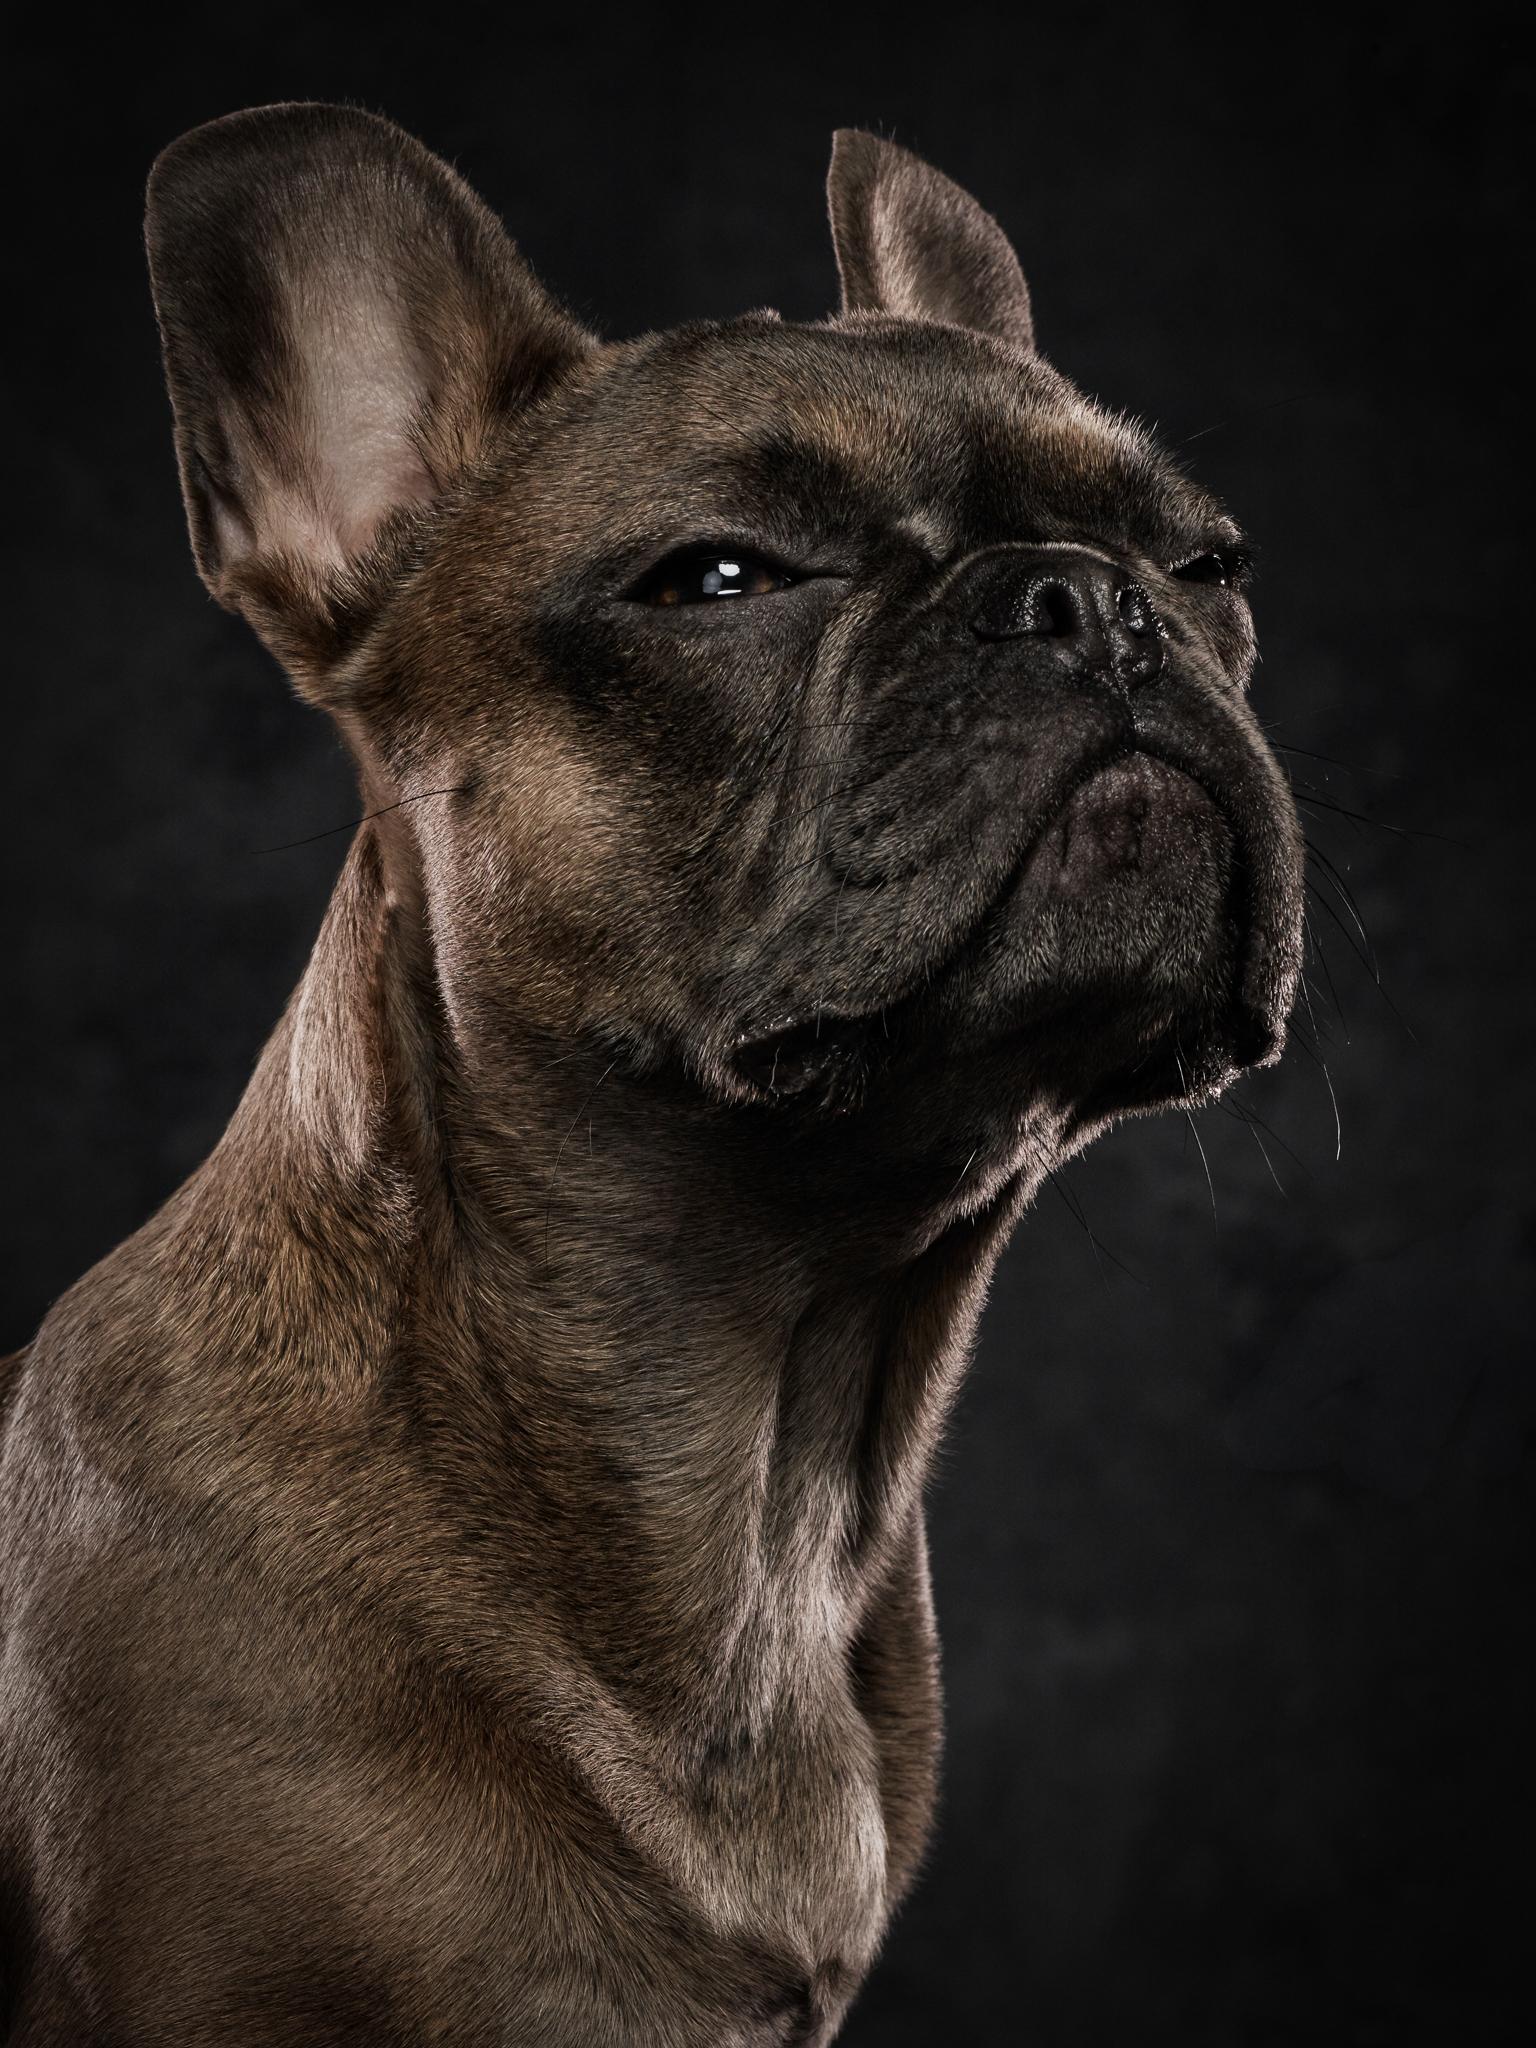 dog-photography-klaus-dyba-4.jpg